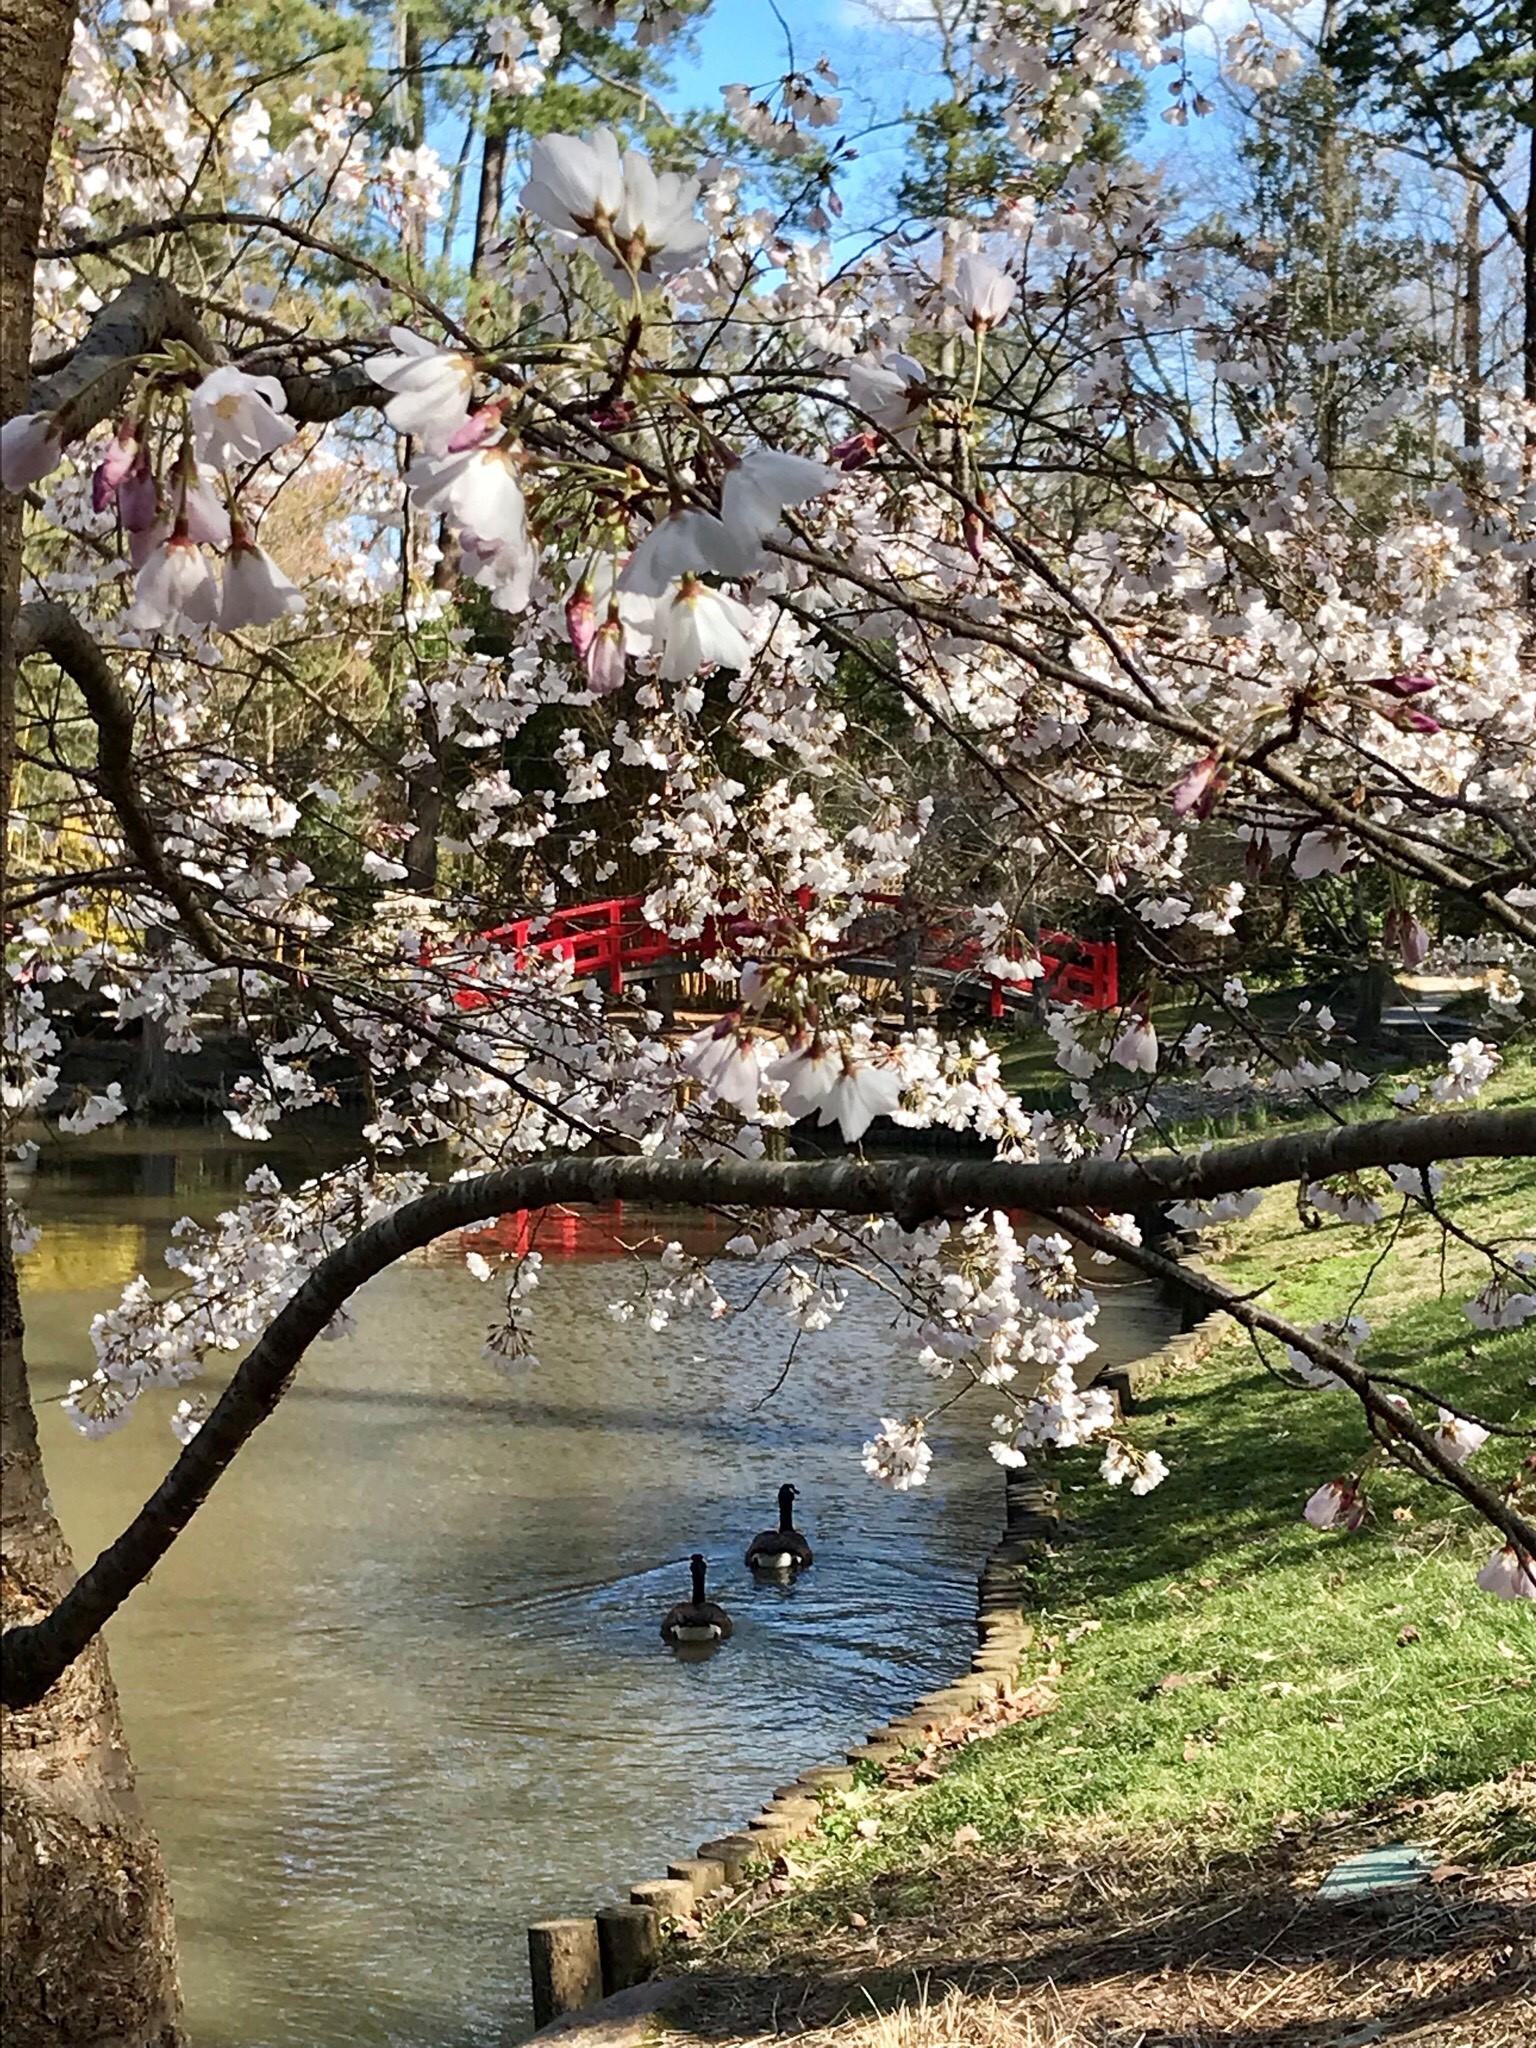 <div class='meta'><div class='origin-logo' data-origin='WTVD'></div><span class='caption-text' data-credit=''>Signs of spring at Duke Gardens</span></div>